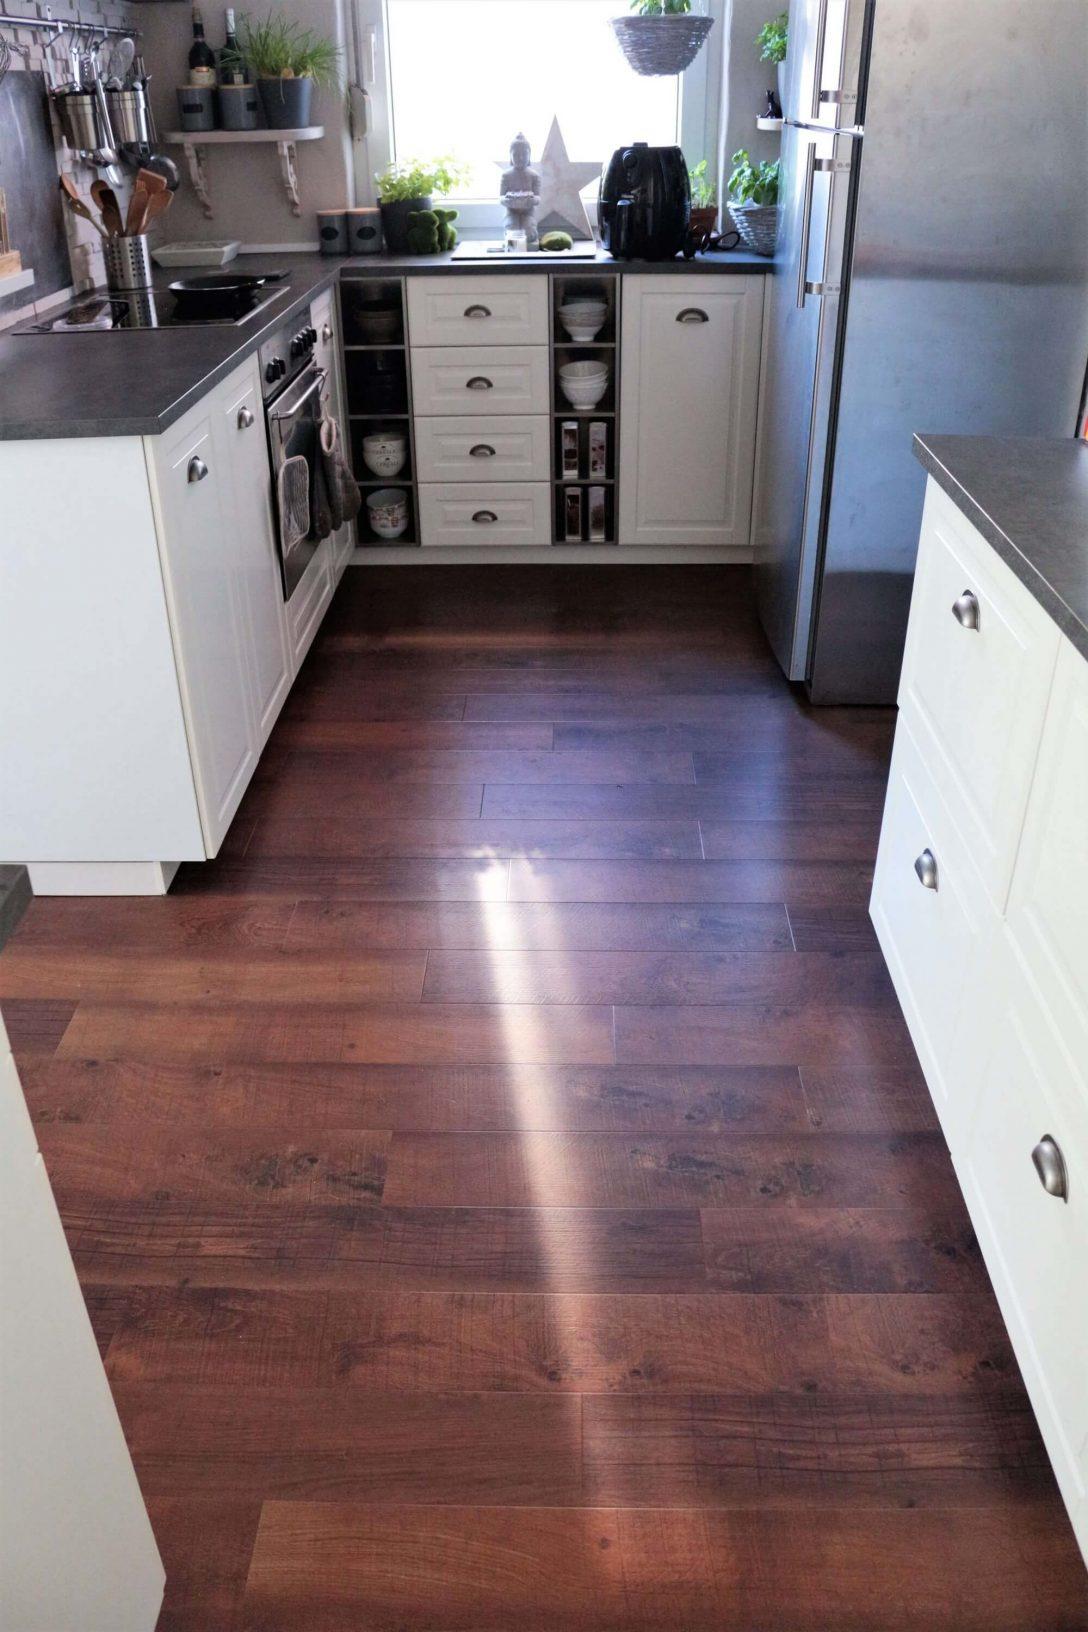 Large Size of Bodenbelag Küche Kaufen Boden In Küche Küche Boden Leiste Welcher Bodenbelag Küche Küche Bodenbelag Küche